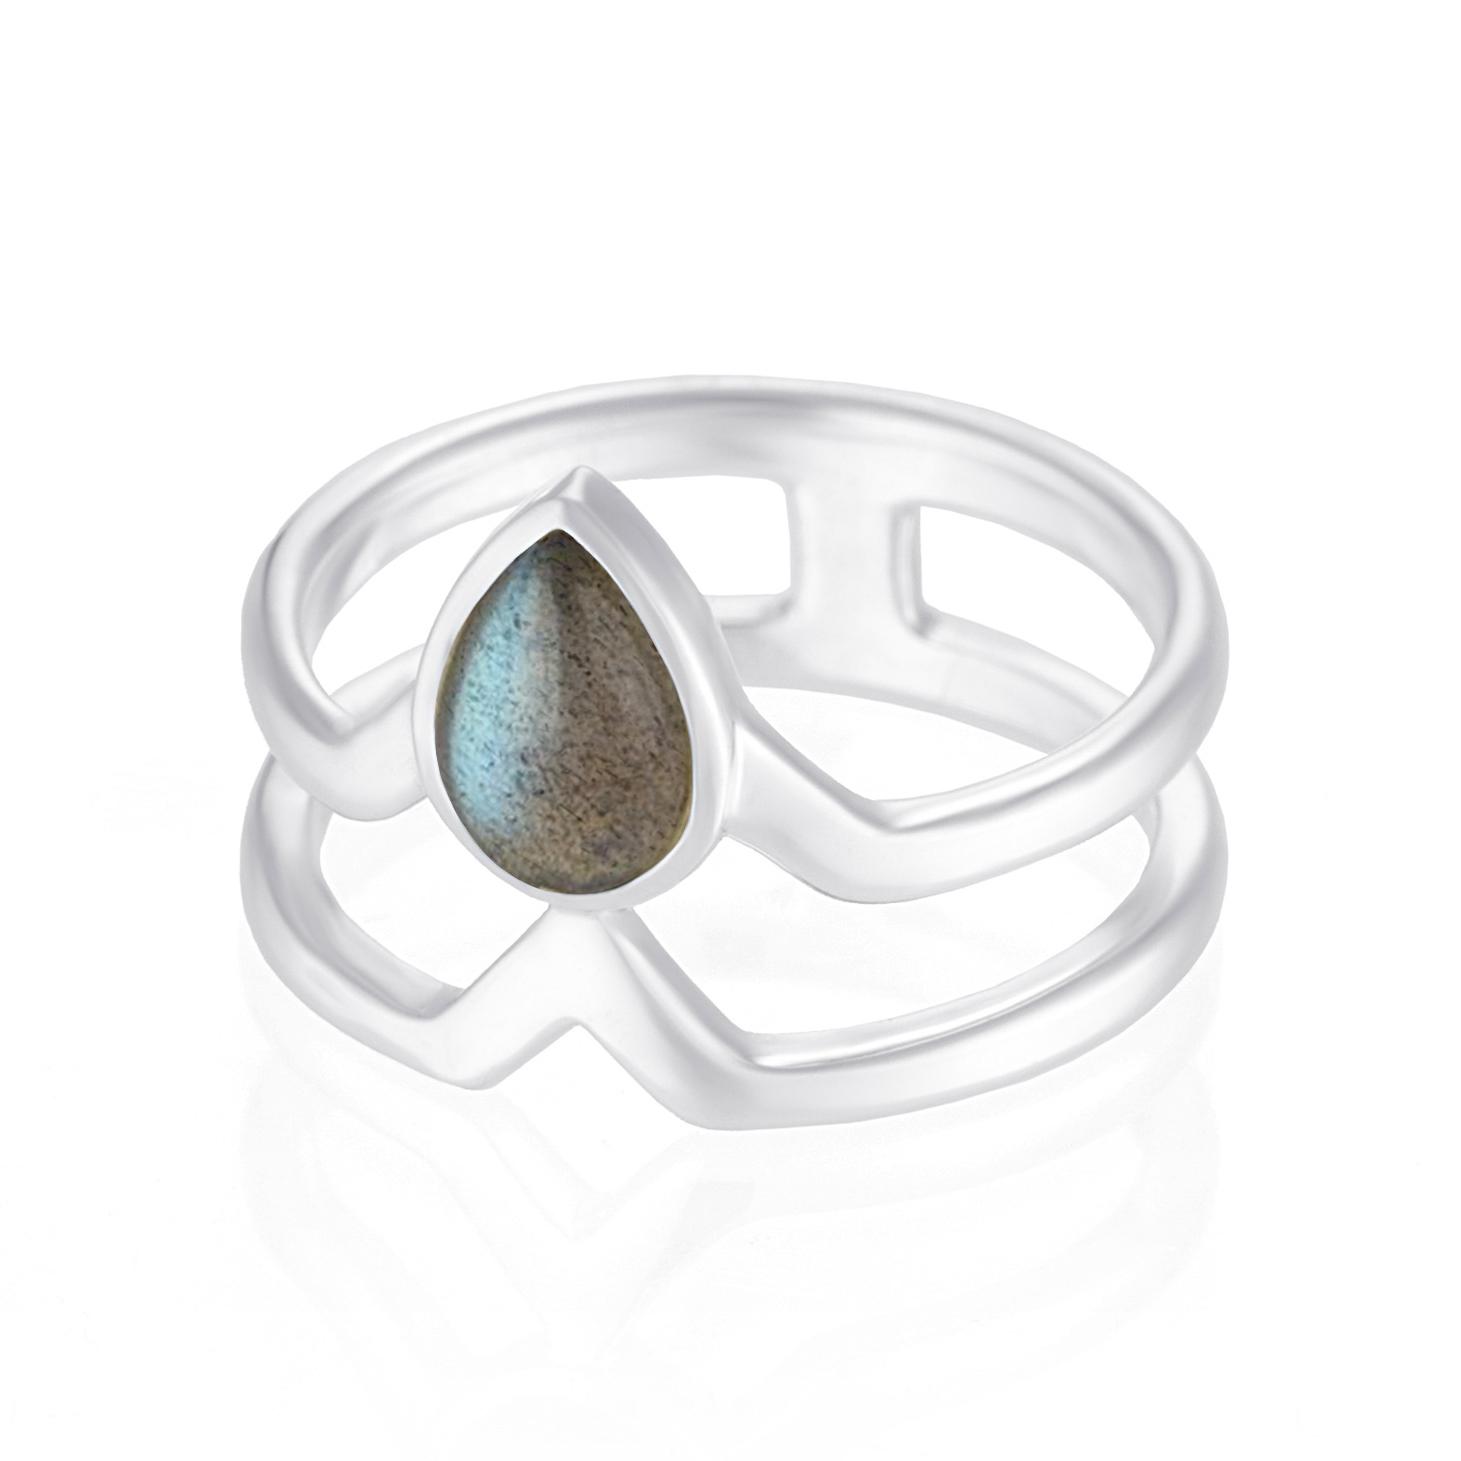 Двойное кольцо TETHYS - Лабрадорит